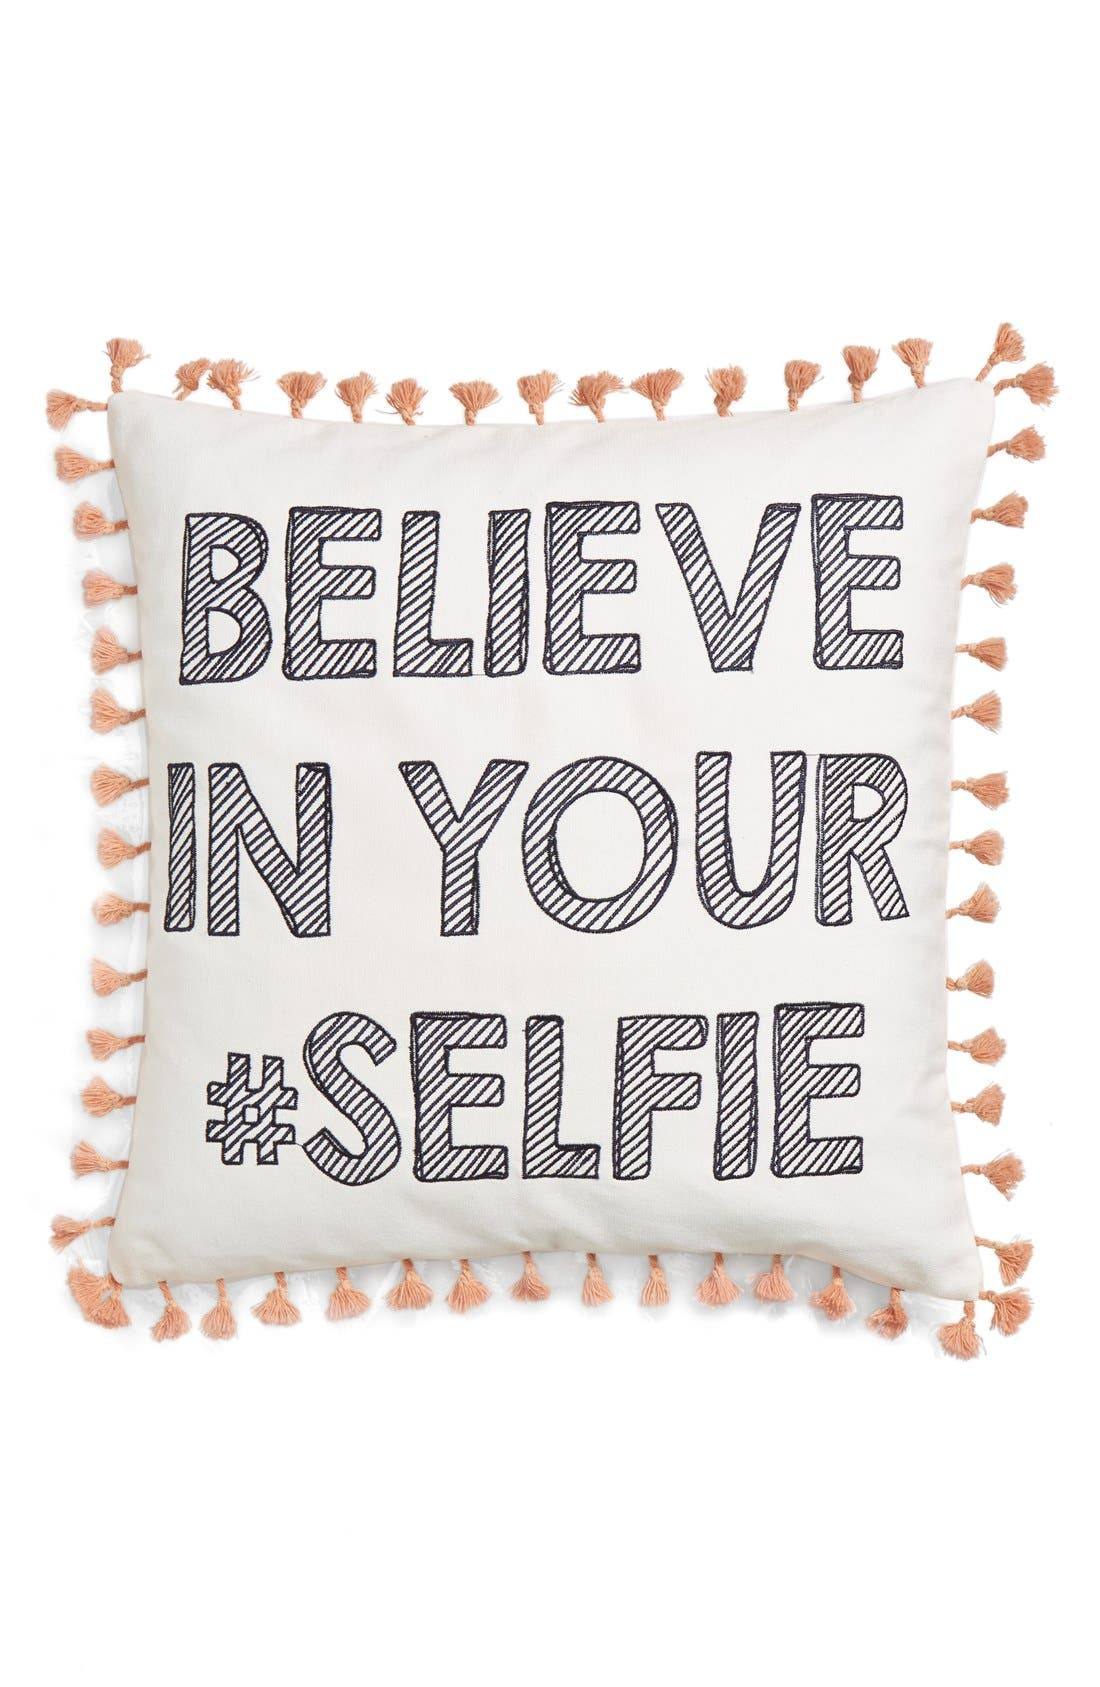 Alternate Image 1 Selected - Levtex 'Believe In Your #Selfie' Pillow